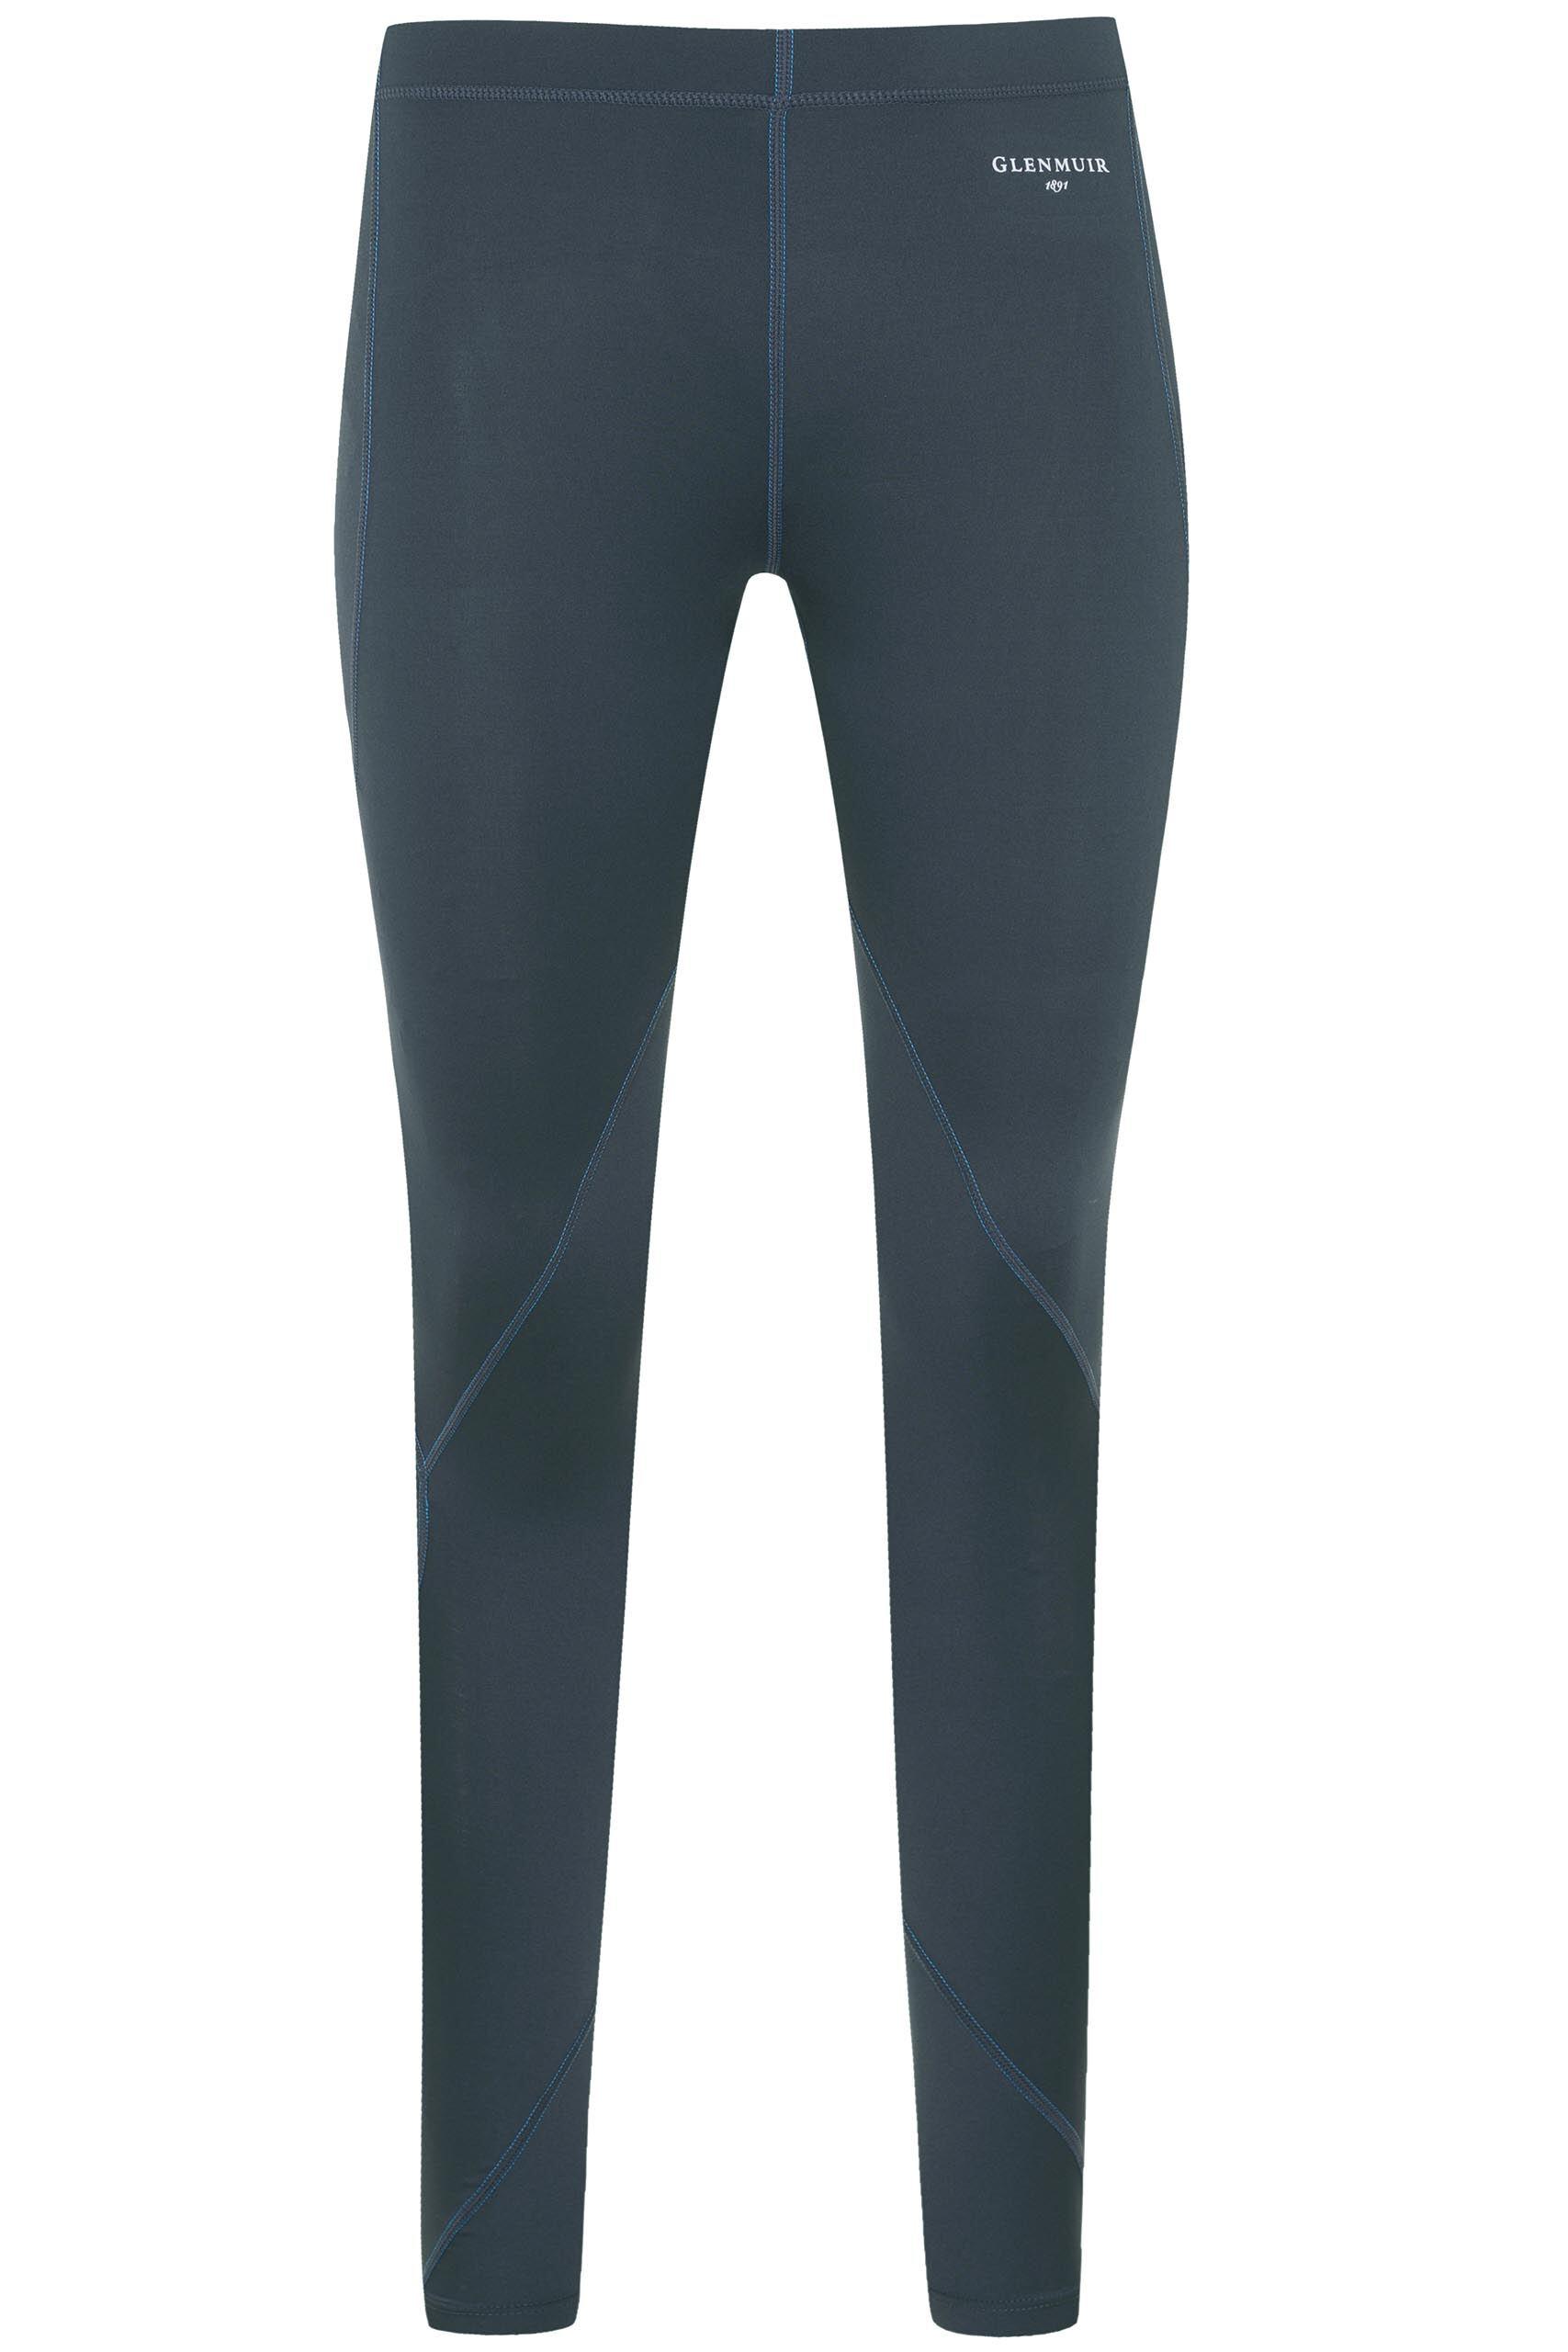 Image of 1 Pack Grey Compression Base Layer Leggings Ladies 10-12 Ladies - Glenmuir